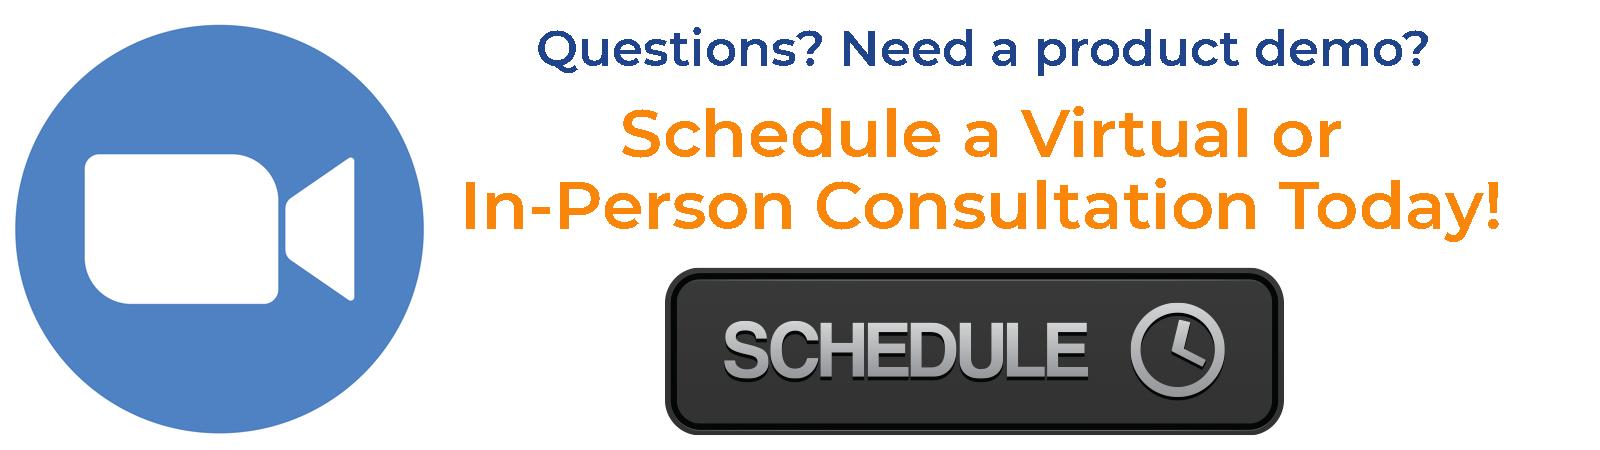 Schedule Consultation with JPR